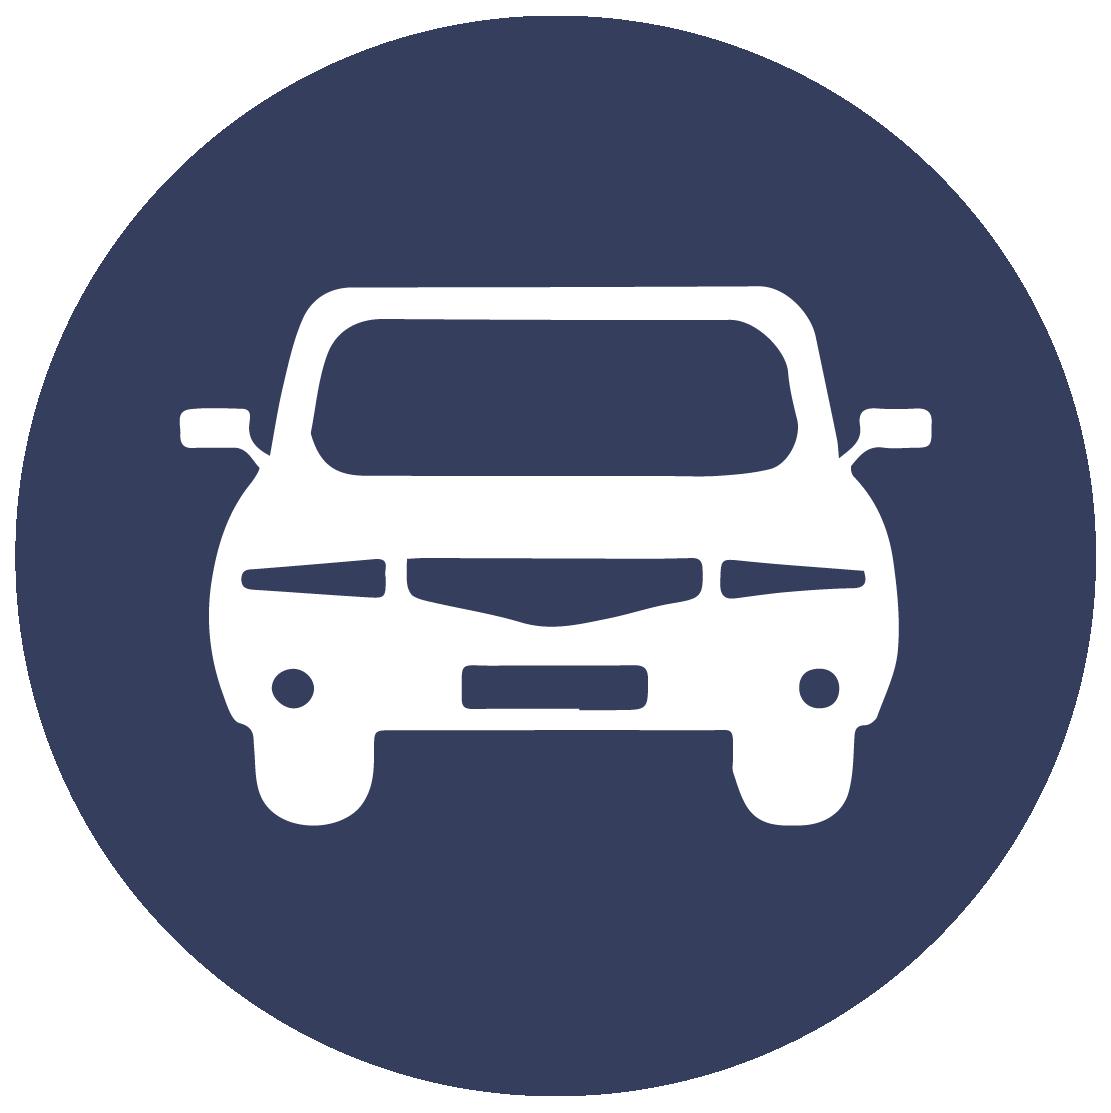 8 Icon Automotive Industry Images - Car Auto Repair ...